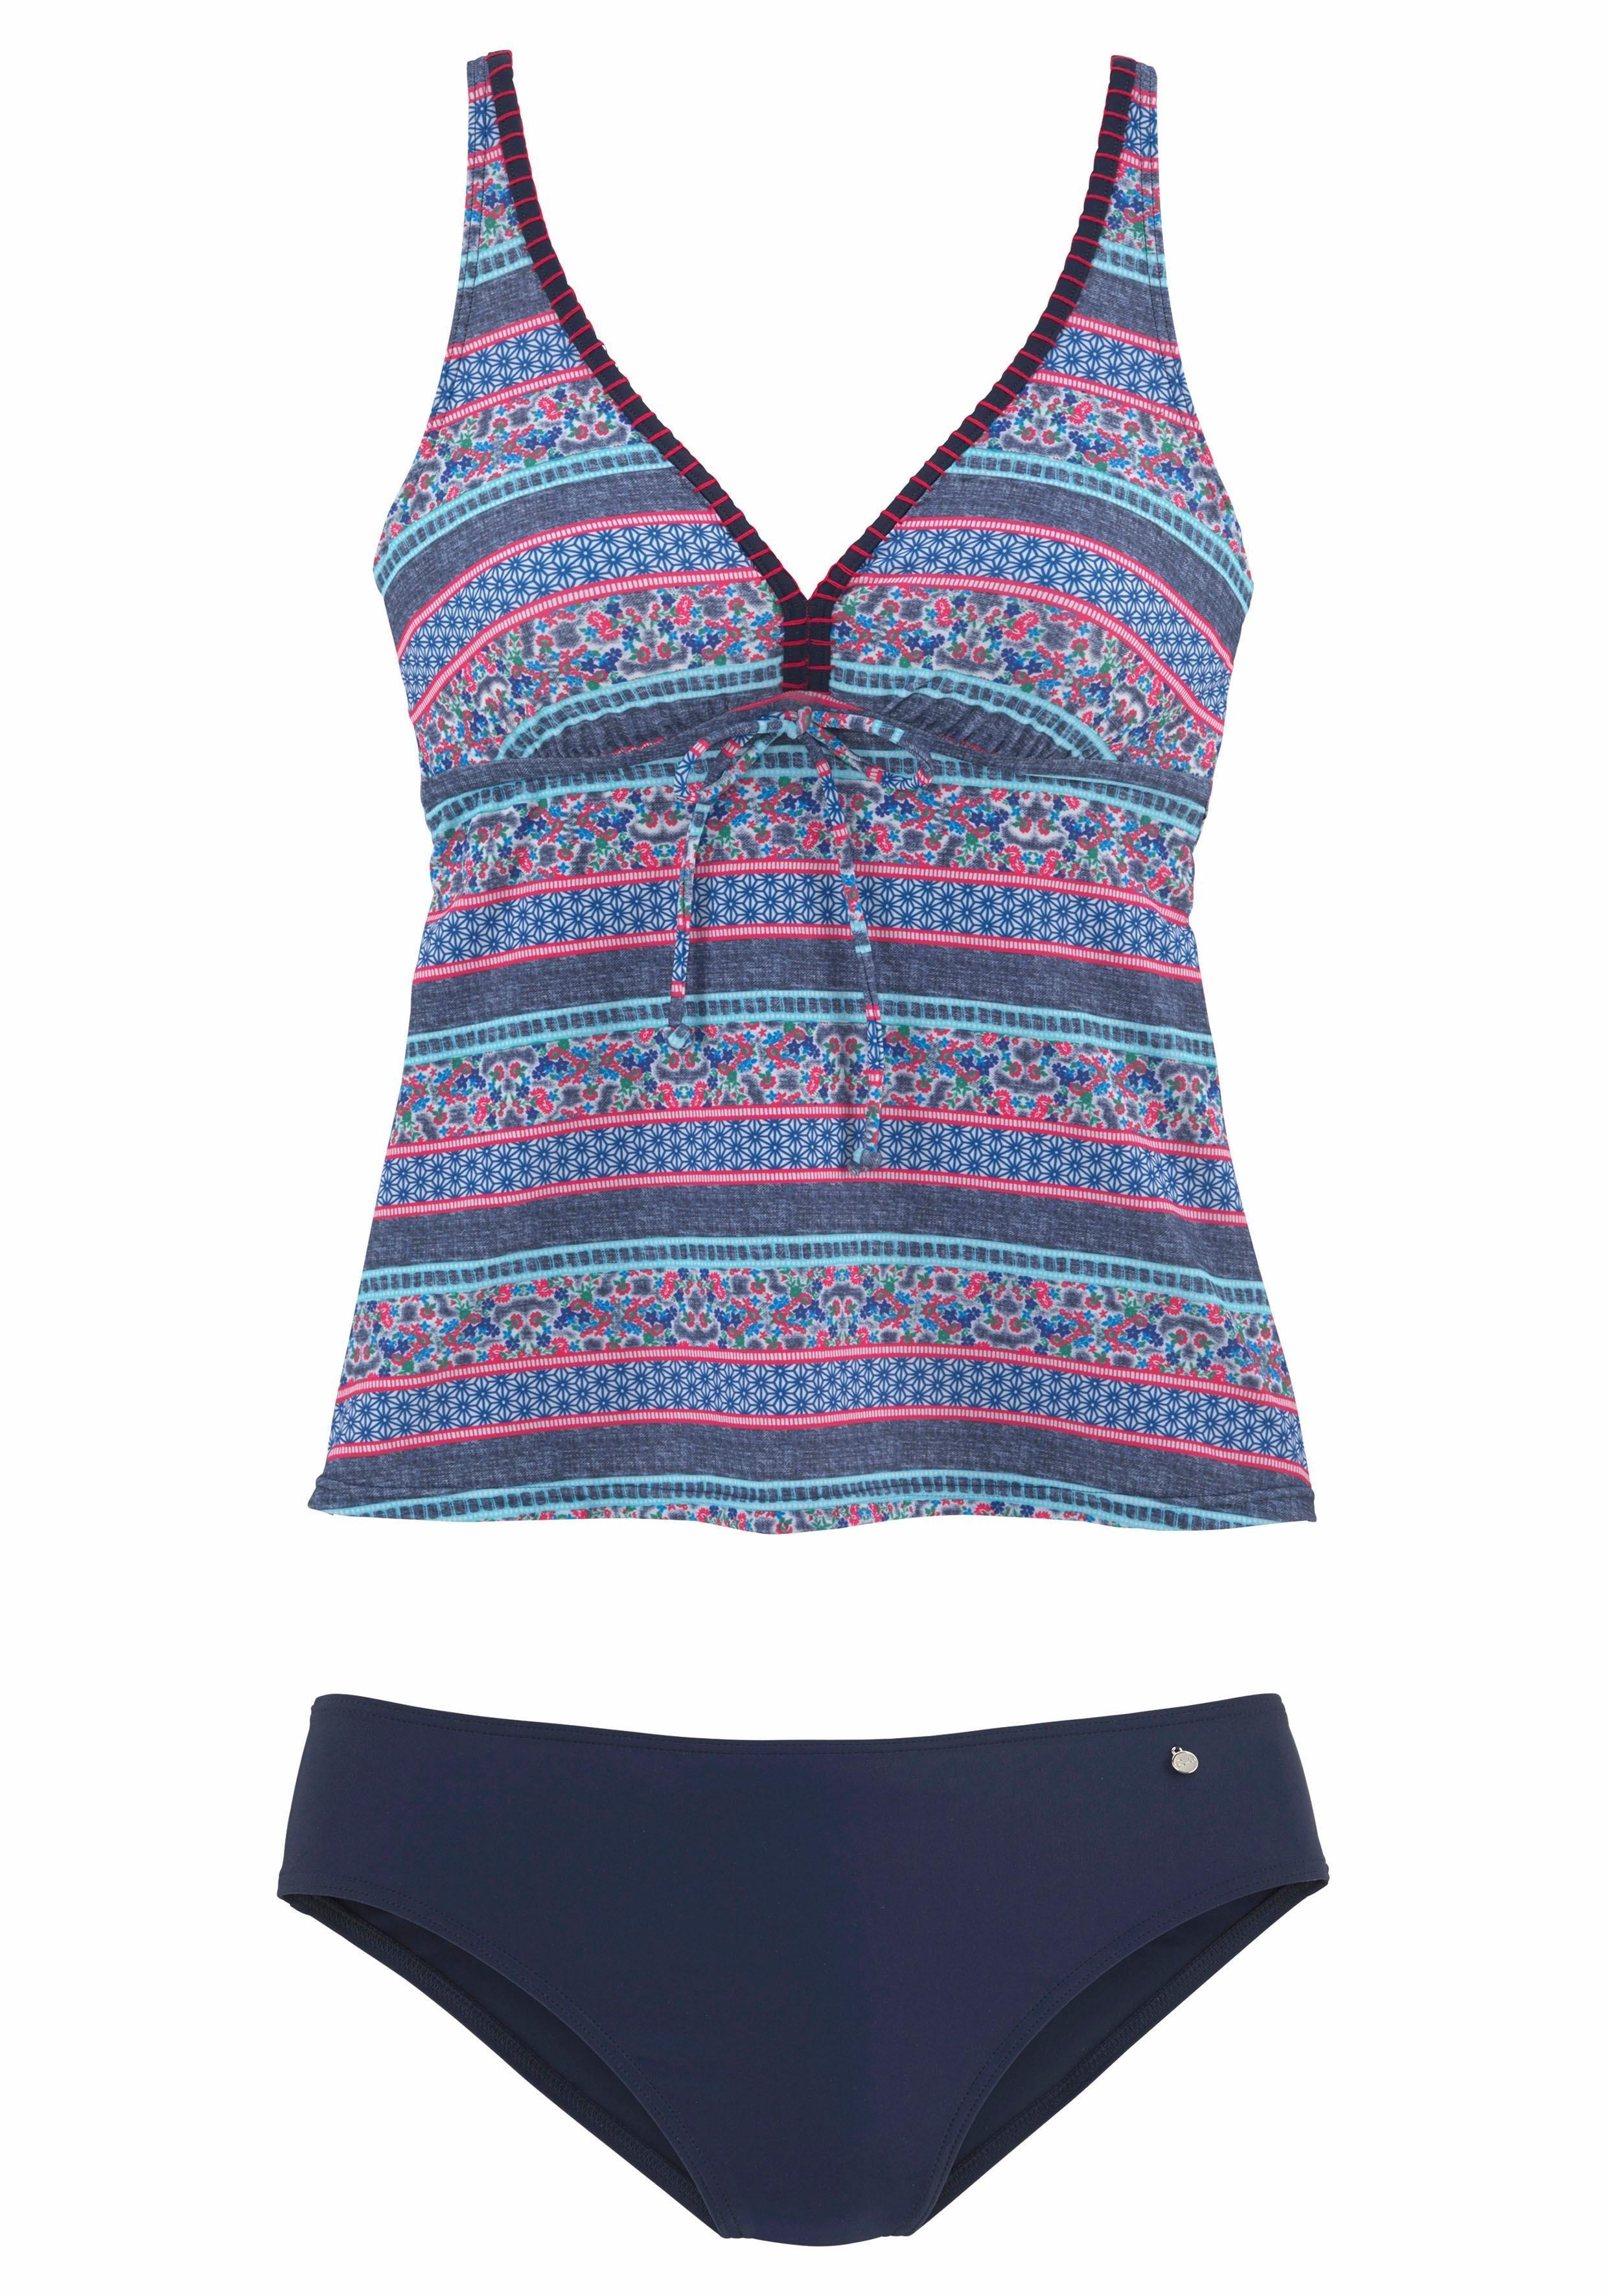 s.Oliver RED LABEL Beachwear Bügel-Tankini   Bekleidung > Bademode > Tankinis   Patchwork   s.Oliver RED LABEL Beachwear